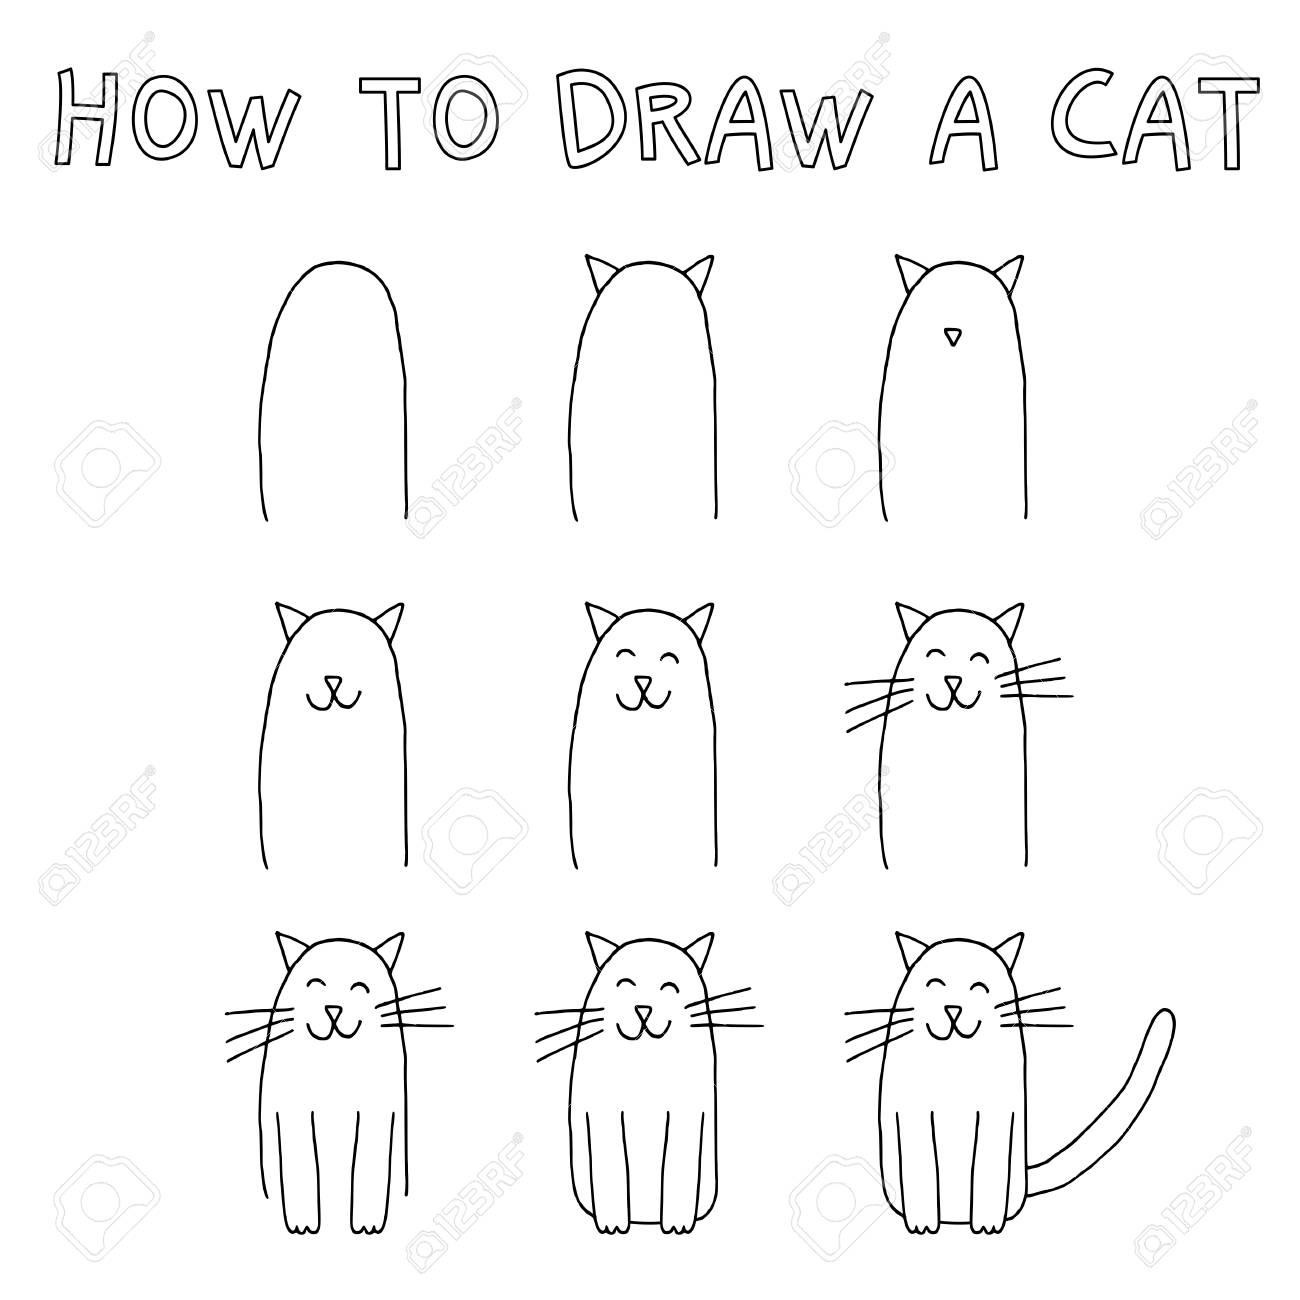 Cómo Dibujar Un Gato Paso A Paso